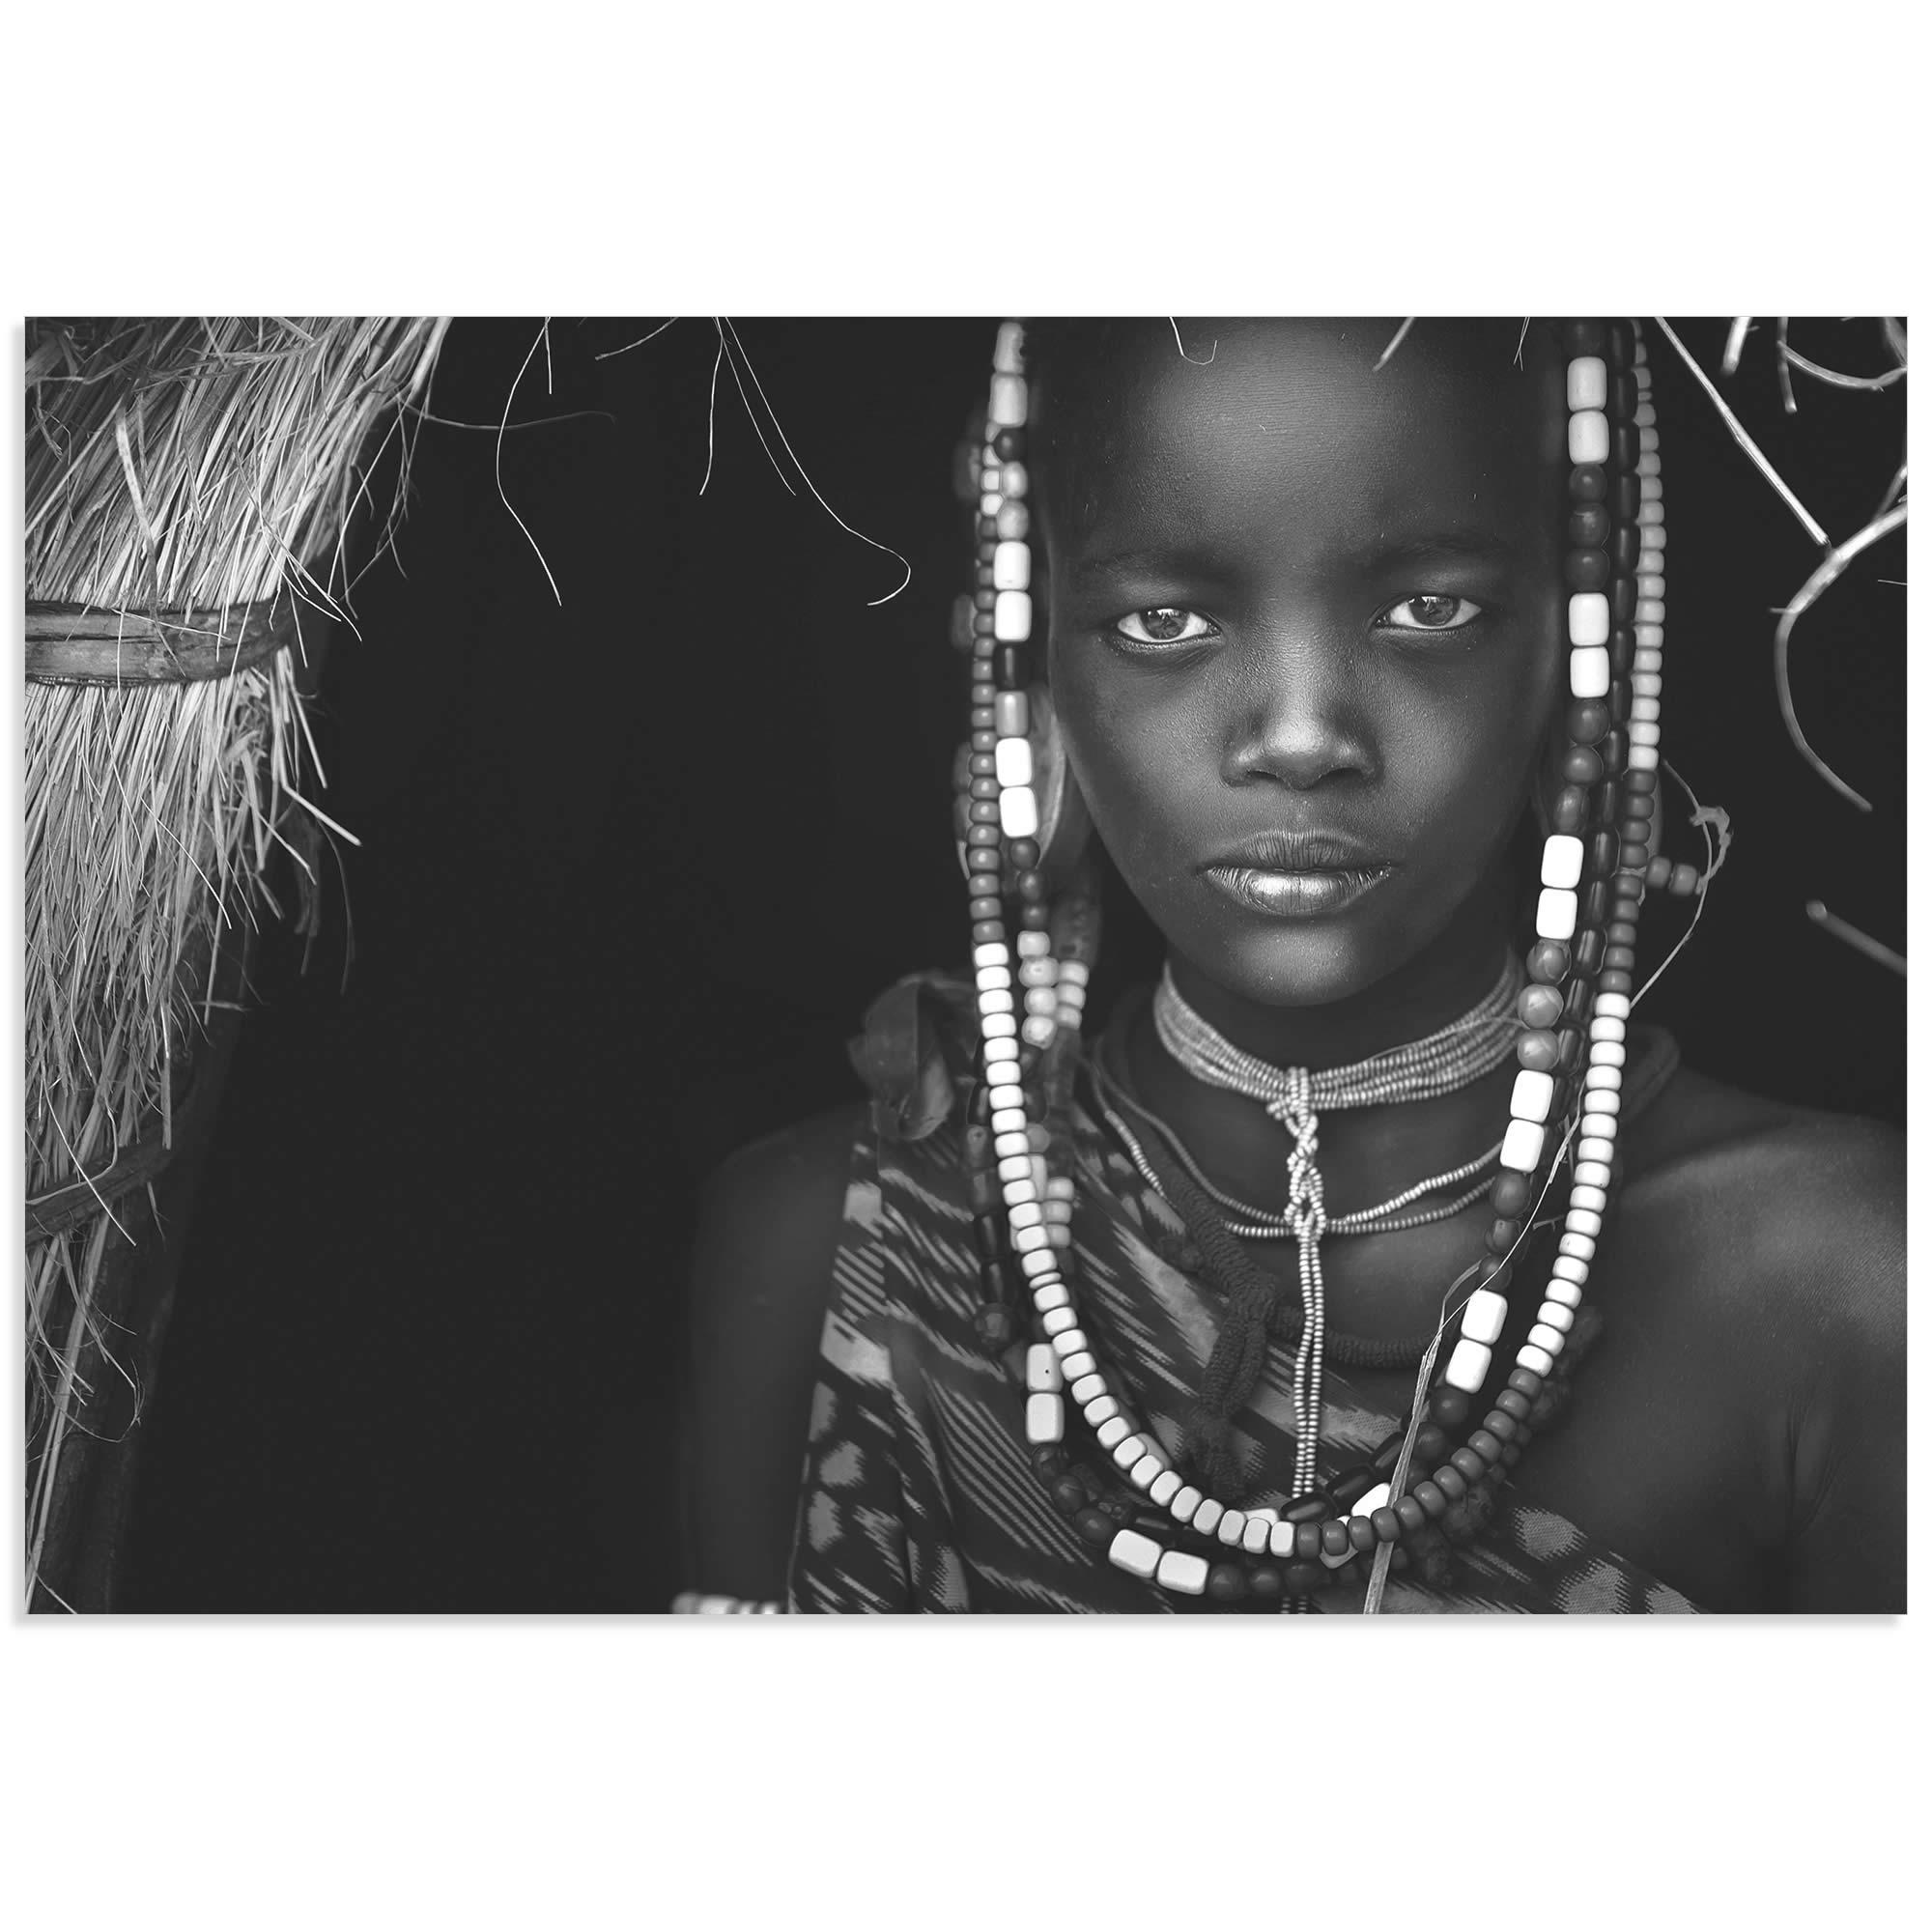 Mursi Girl by Hesham Alhumaid - African Fashion Art on Metal or Acrylic